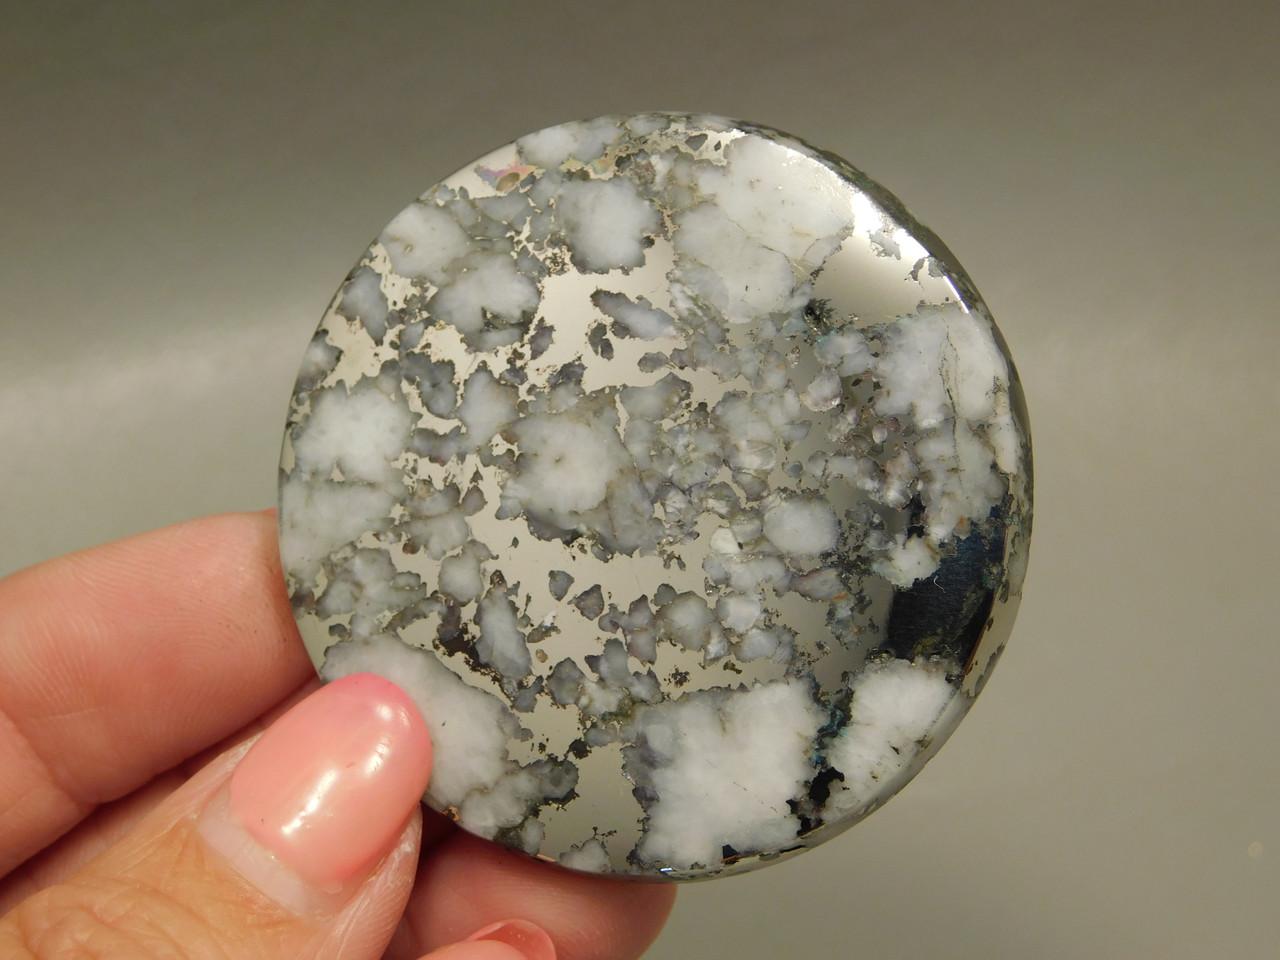 Mohawkite 48 mm Round Jewelry Stone Cabochon #10